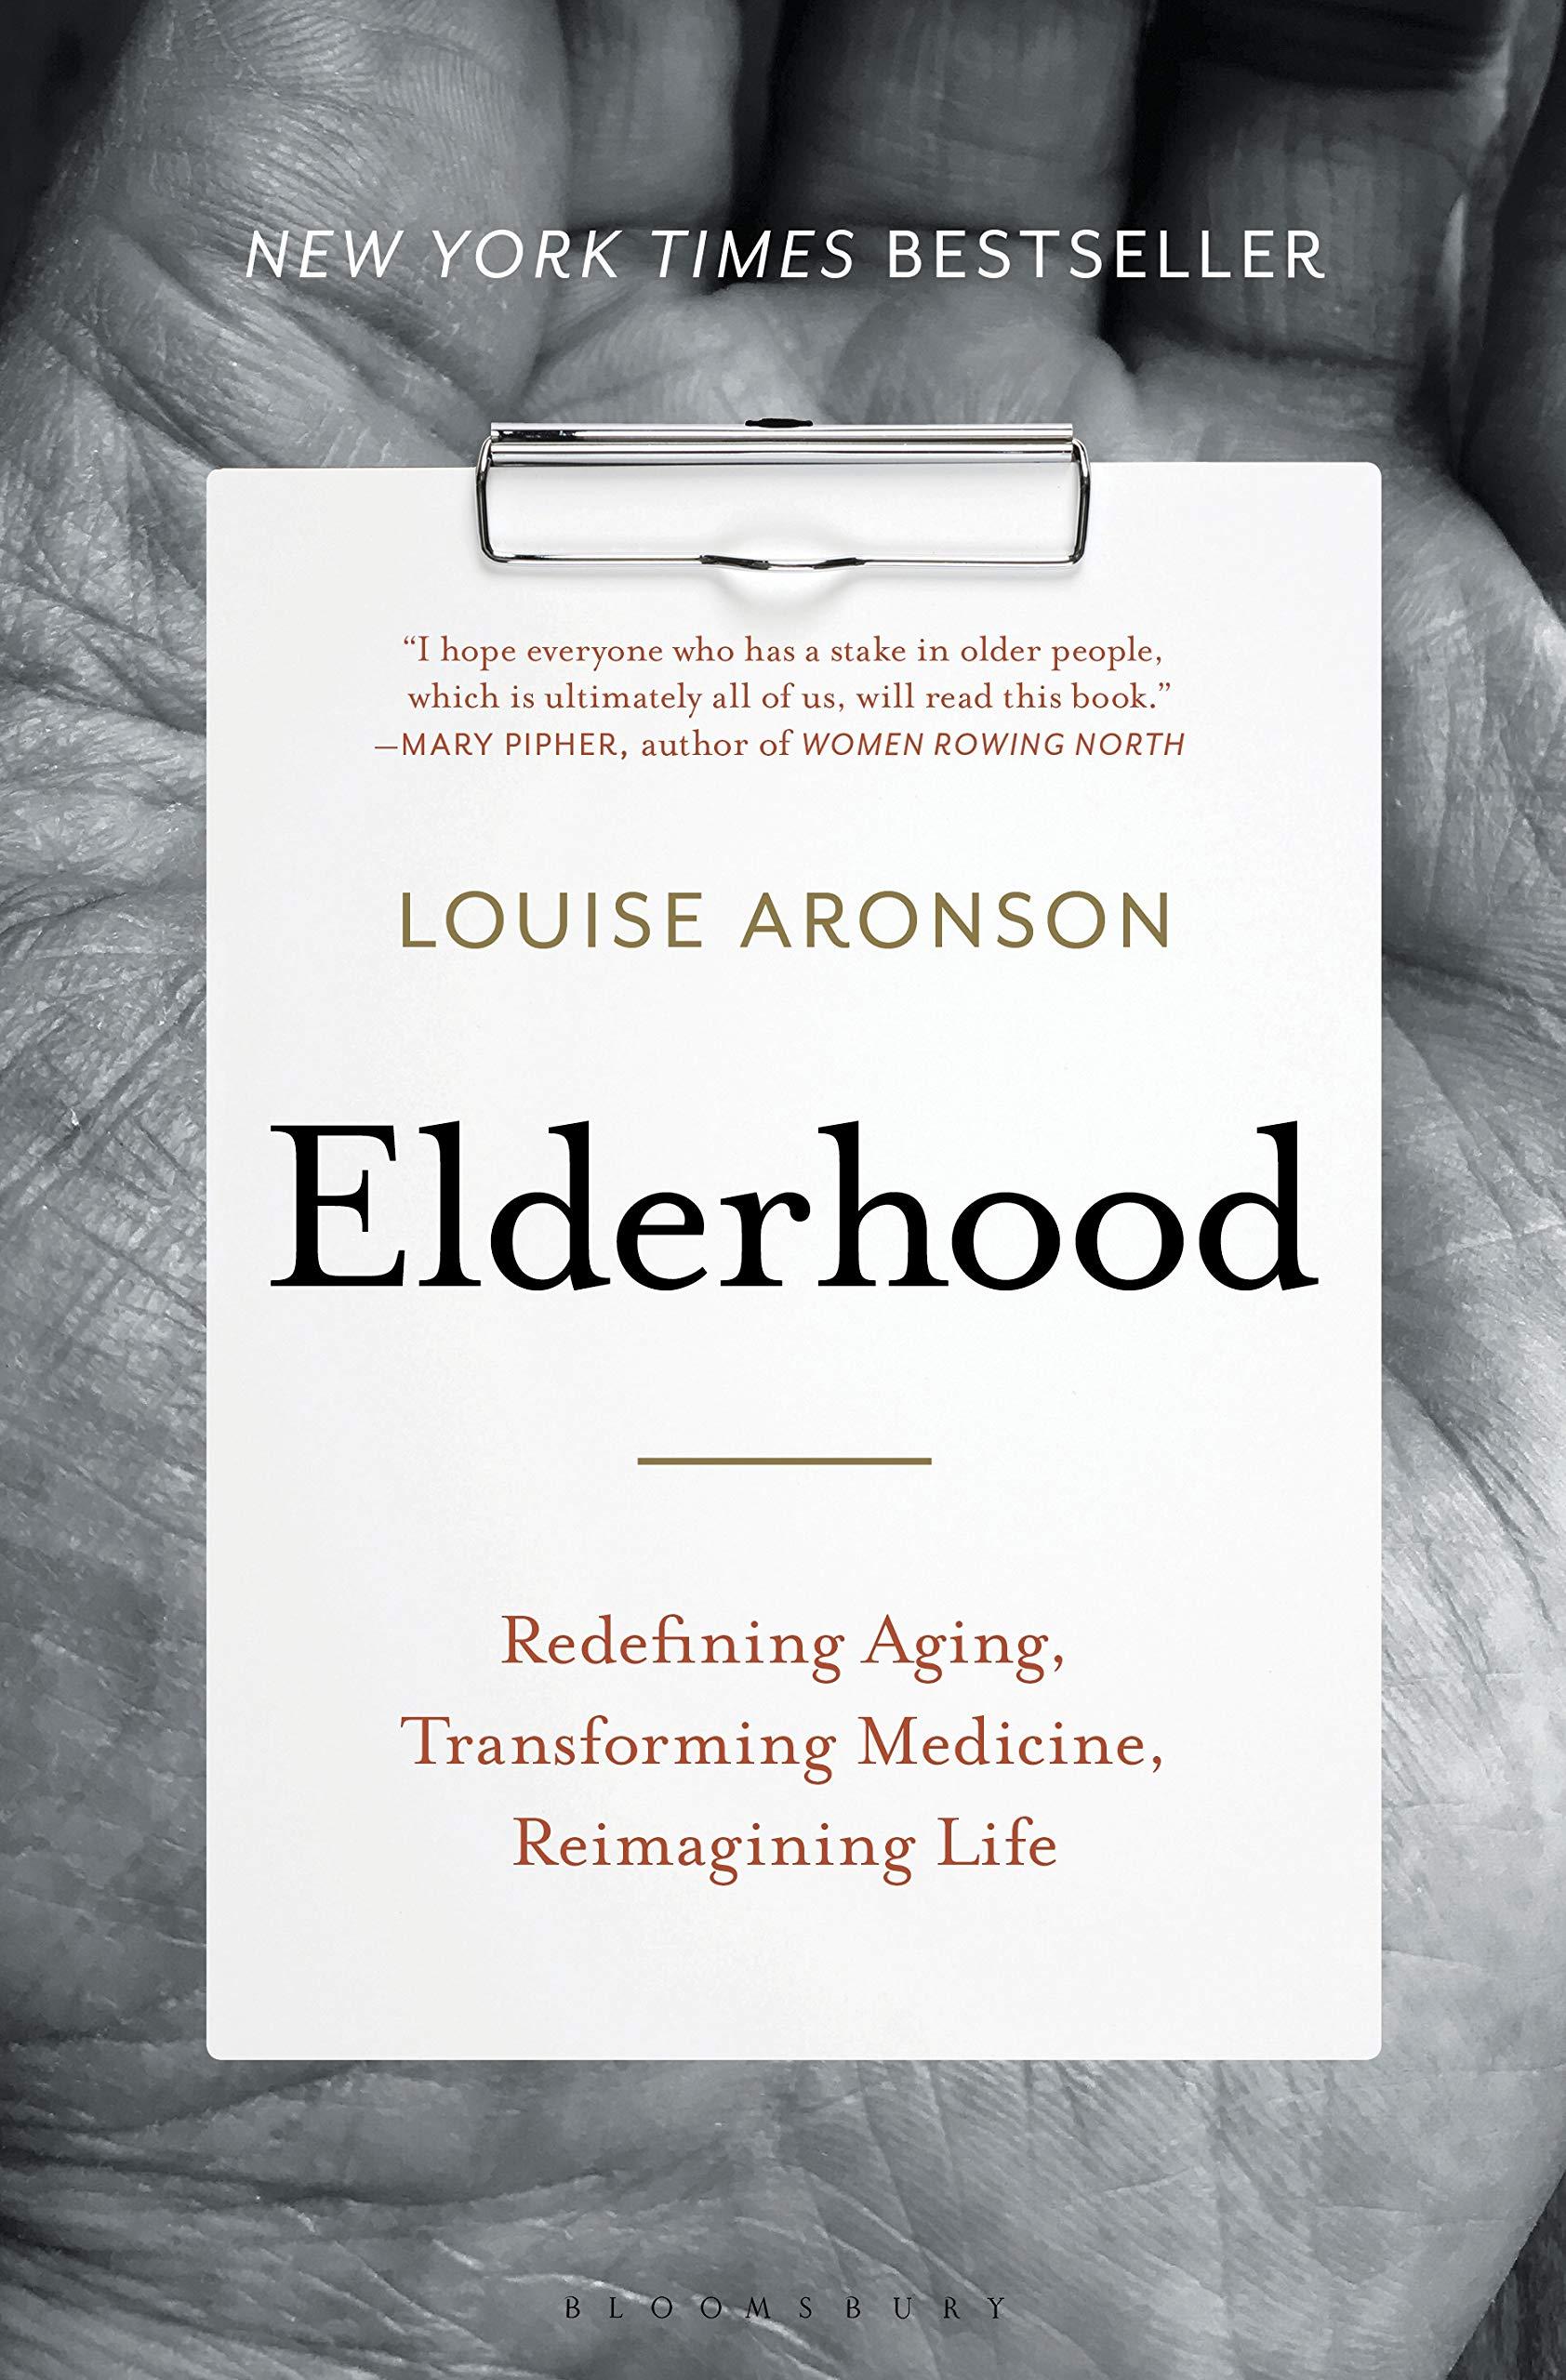 Elderhood: Redefining Aging, Transforming Medicine